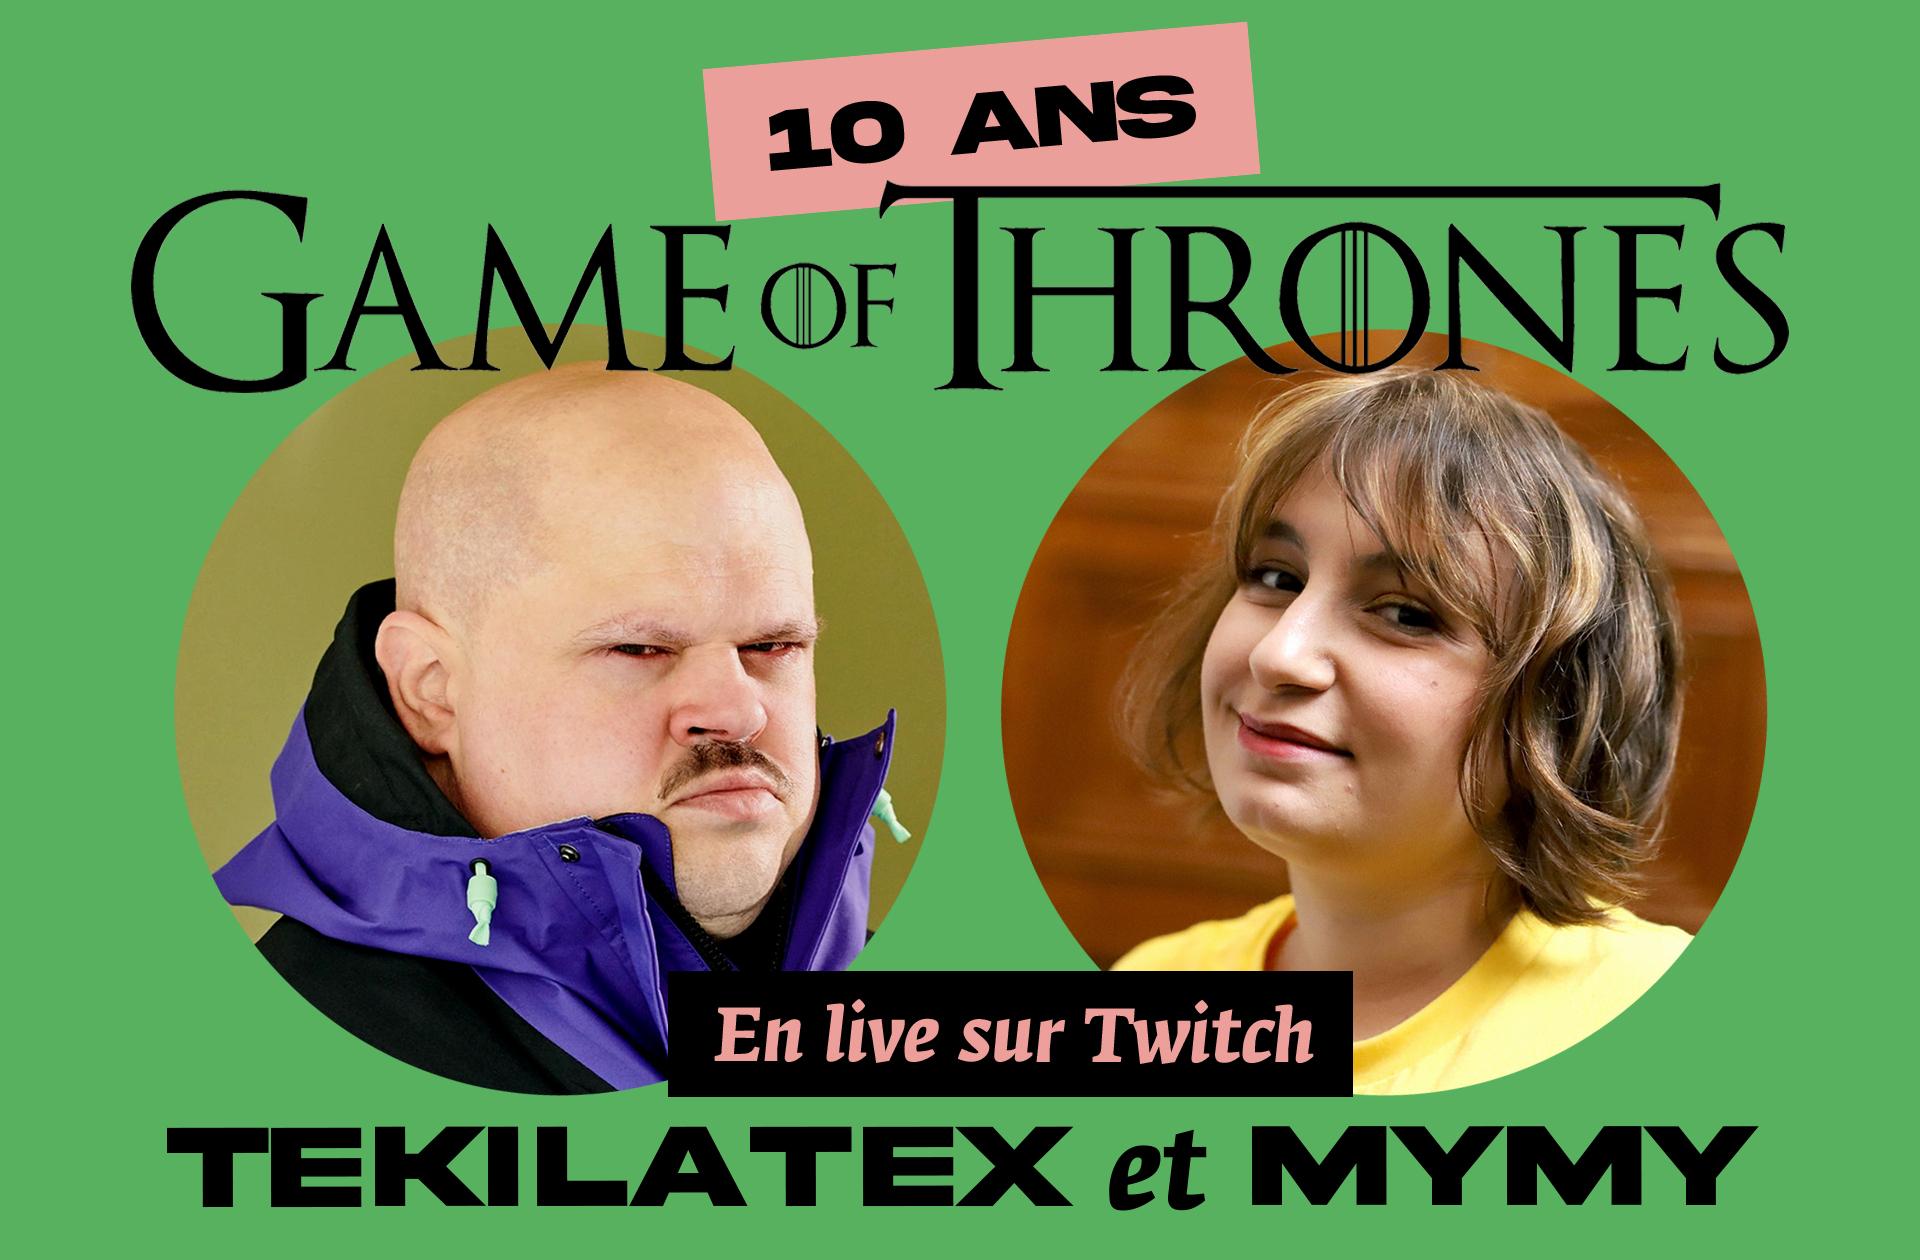 Mymy et Tekilatex fêtent les 10 ans de « Game of Thrones»